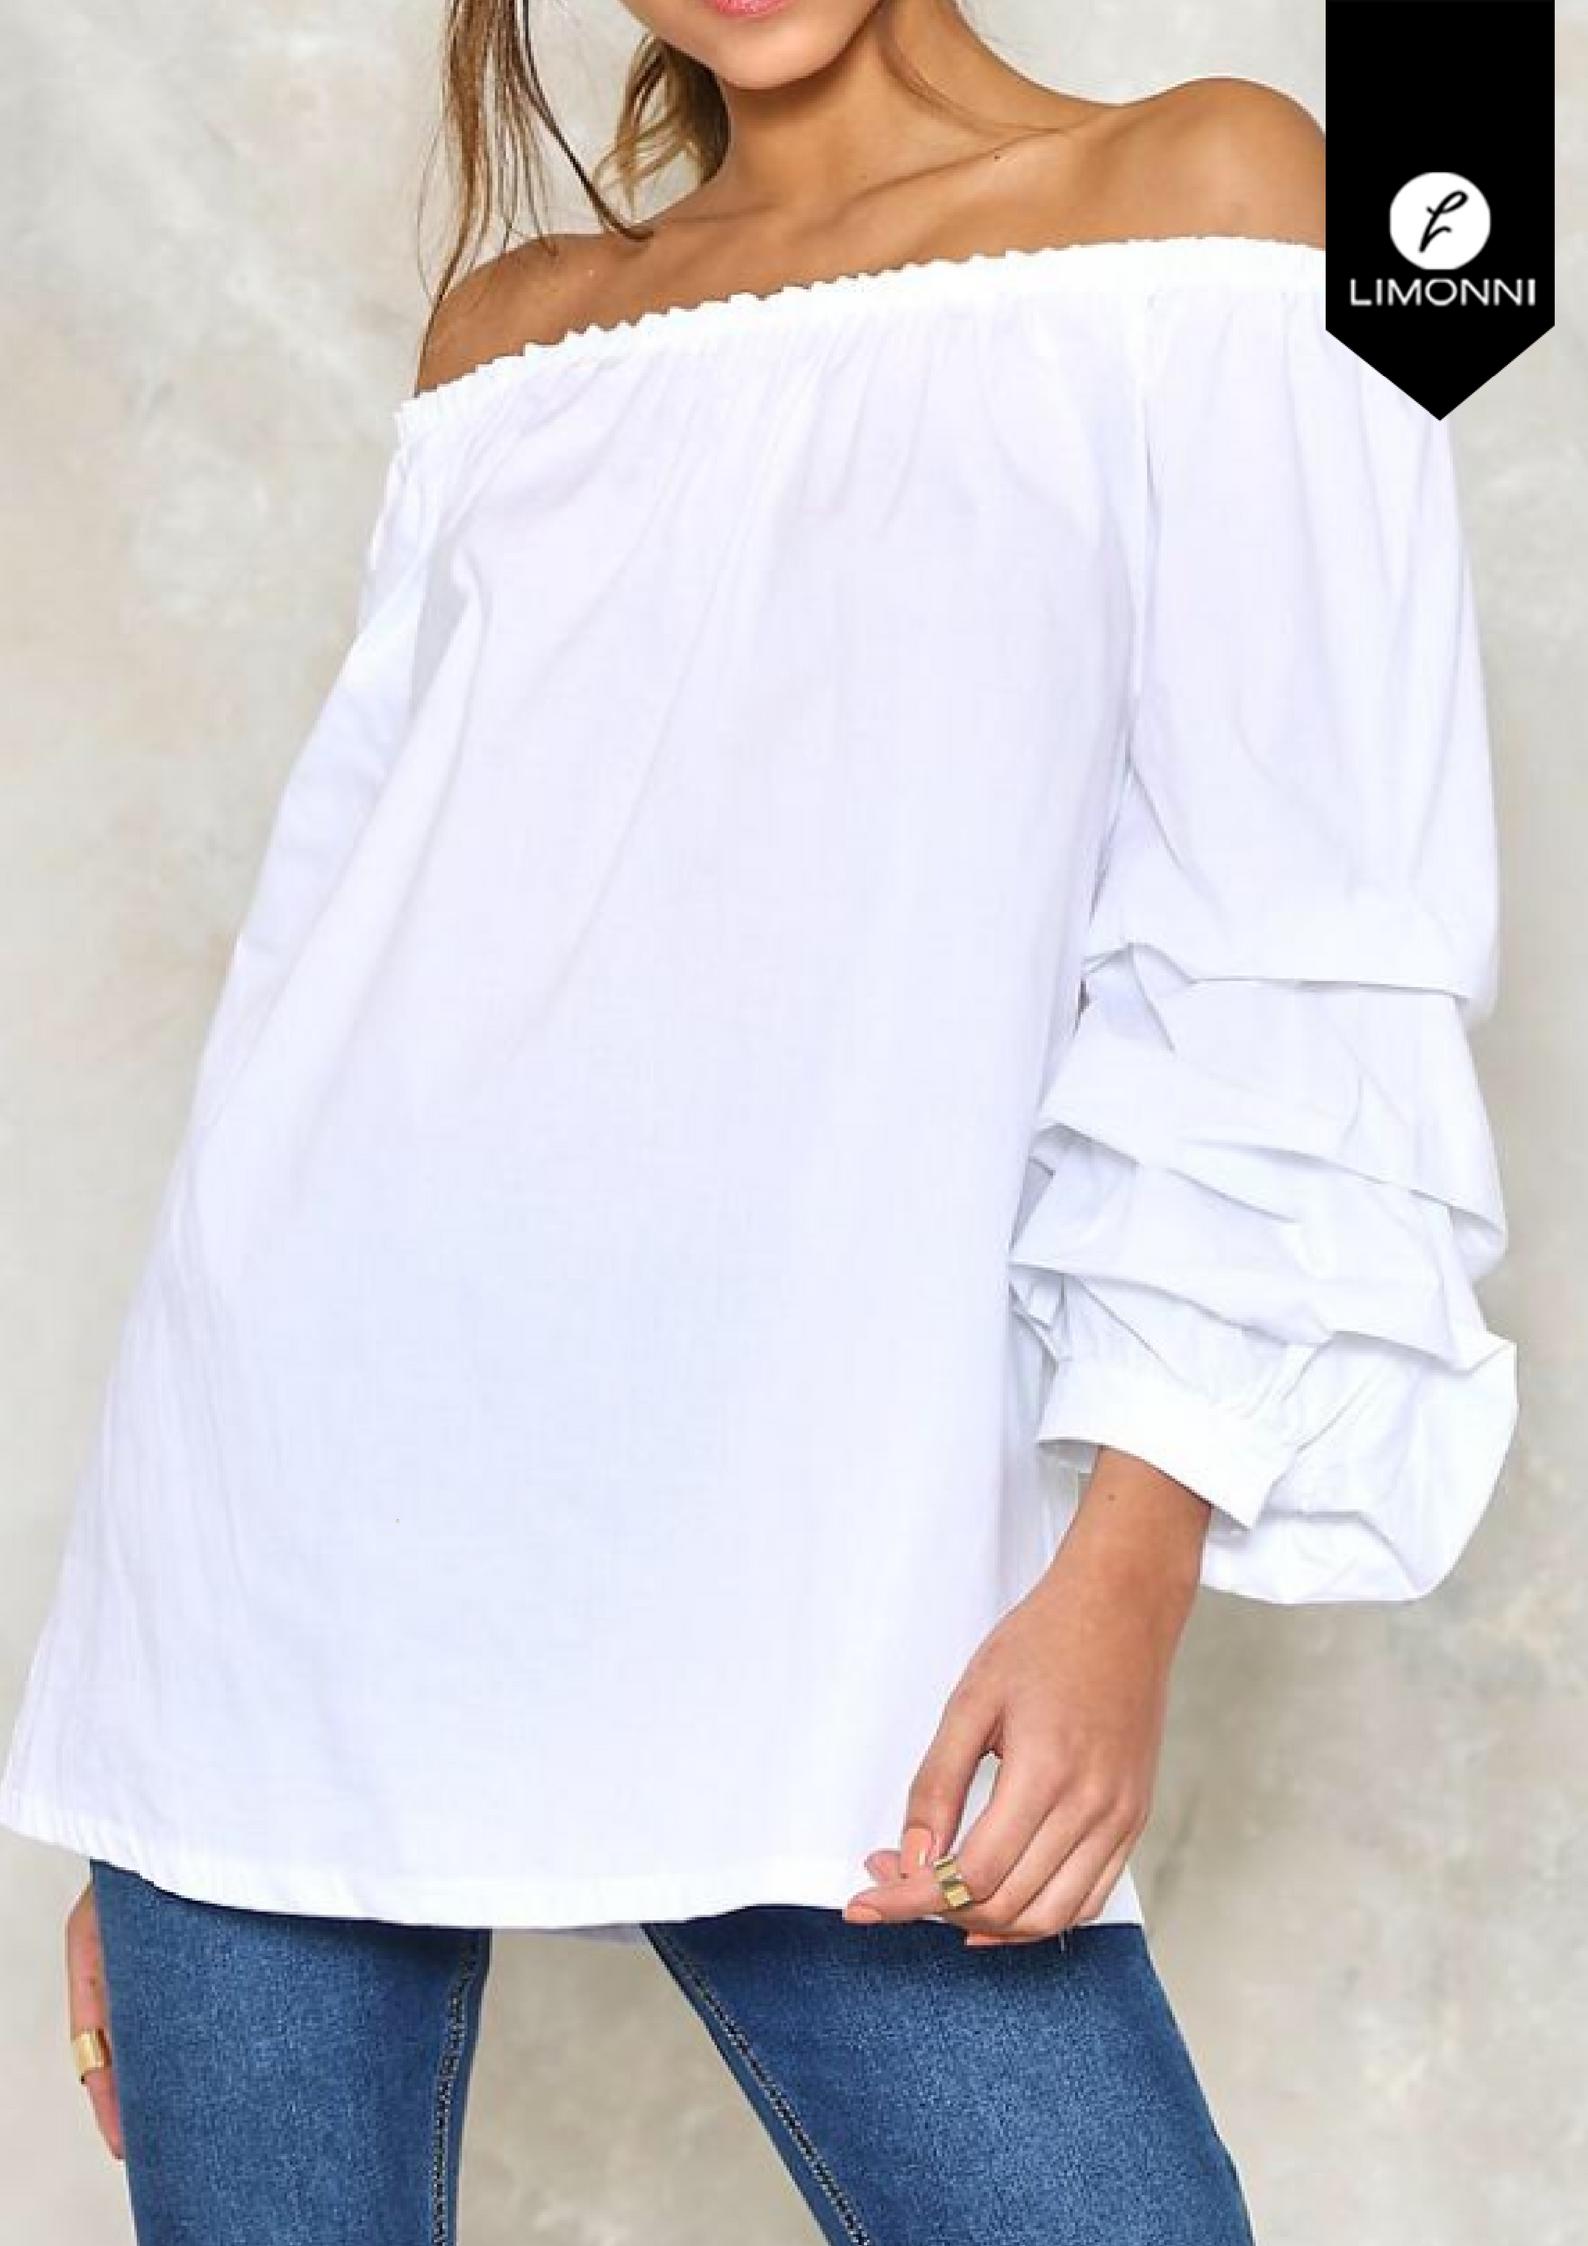 Blusas para mujer Limonni Bennett LI1387 Campesinas